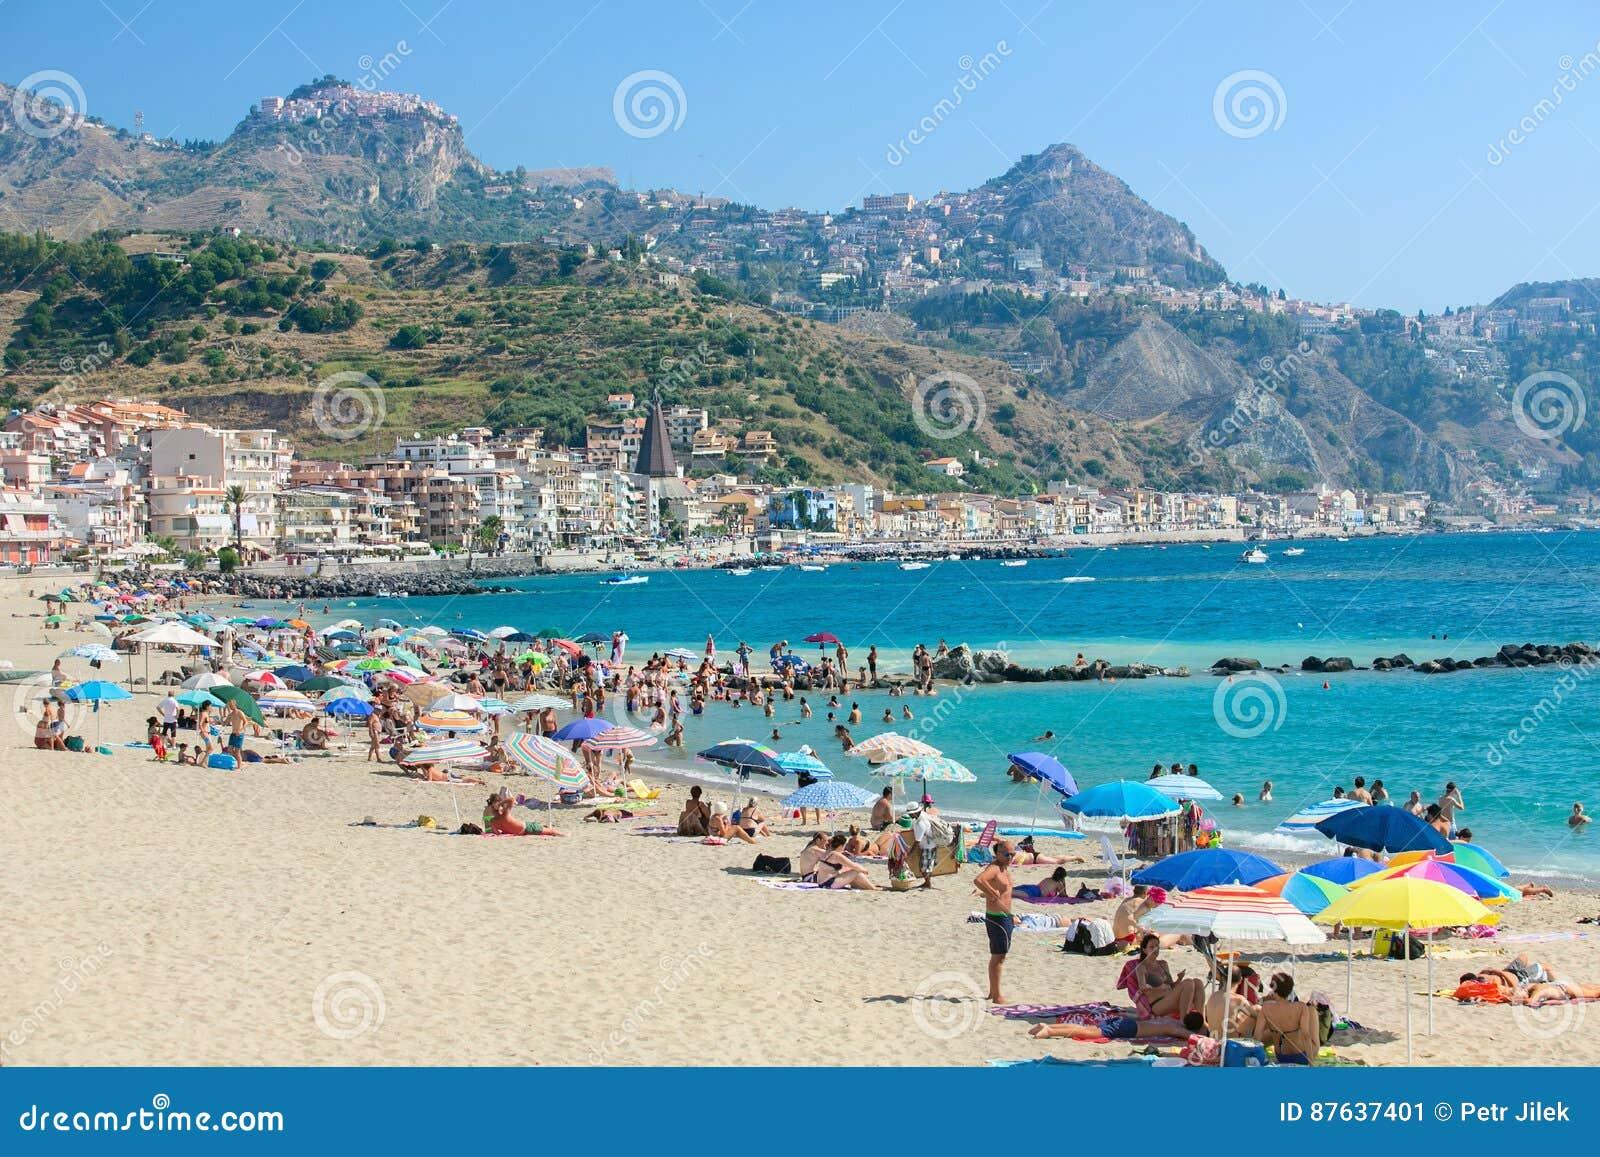 Strand Giardini Naxos - Lido Europa, Giardini Naxos fényképe - Tripadvisor